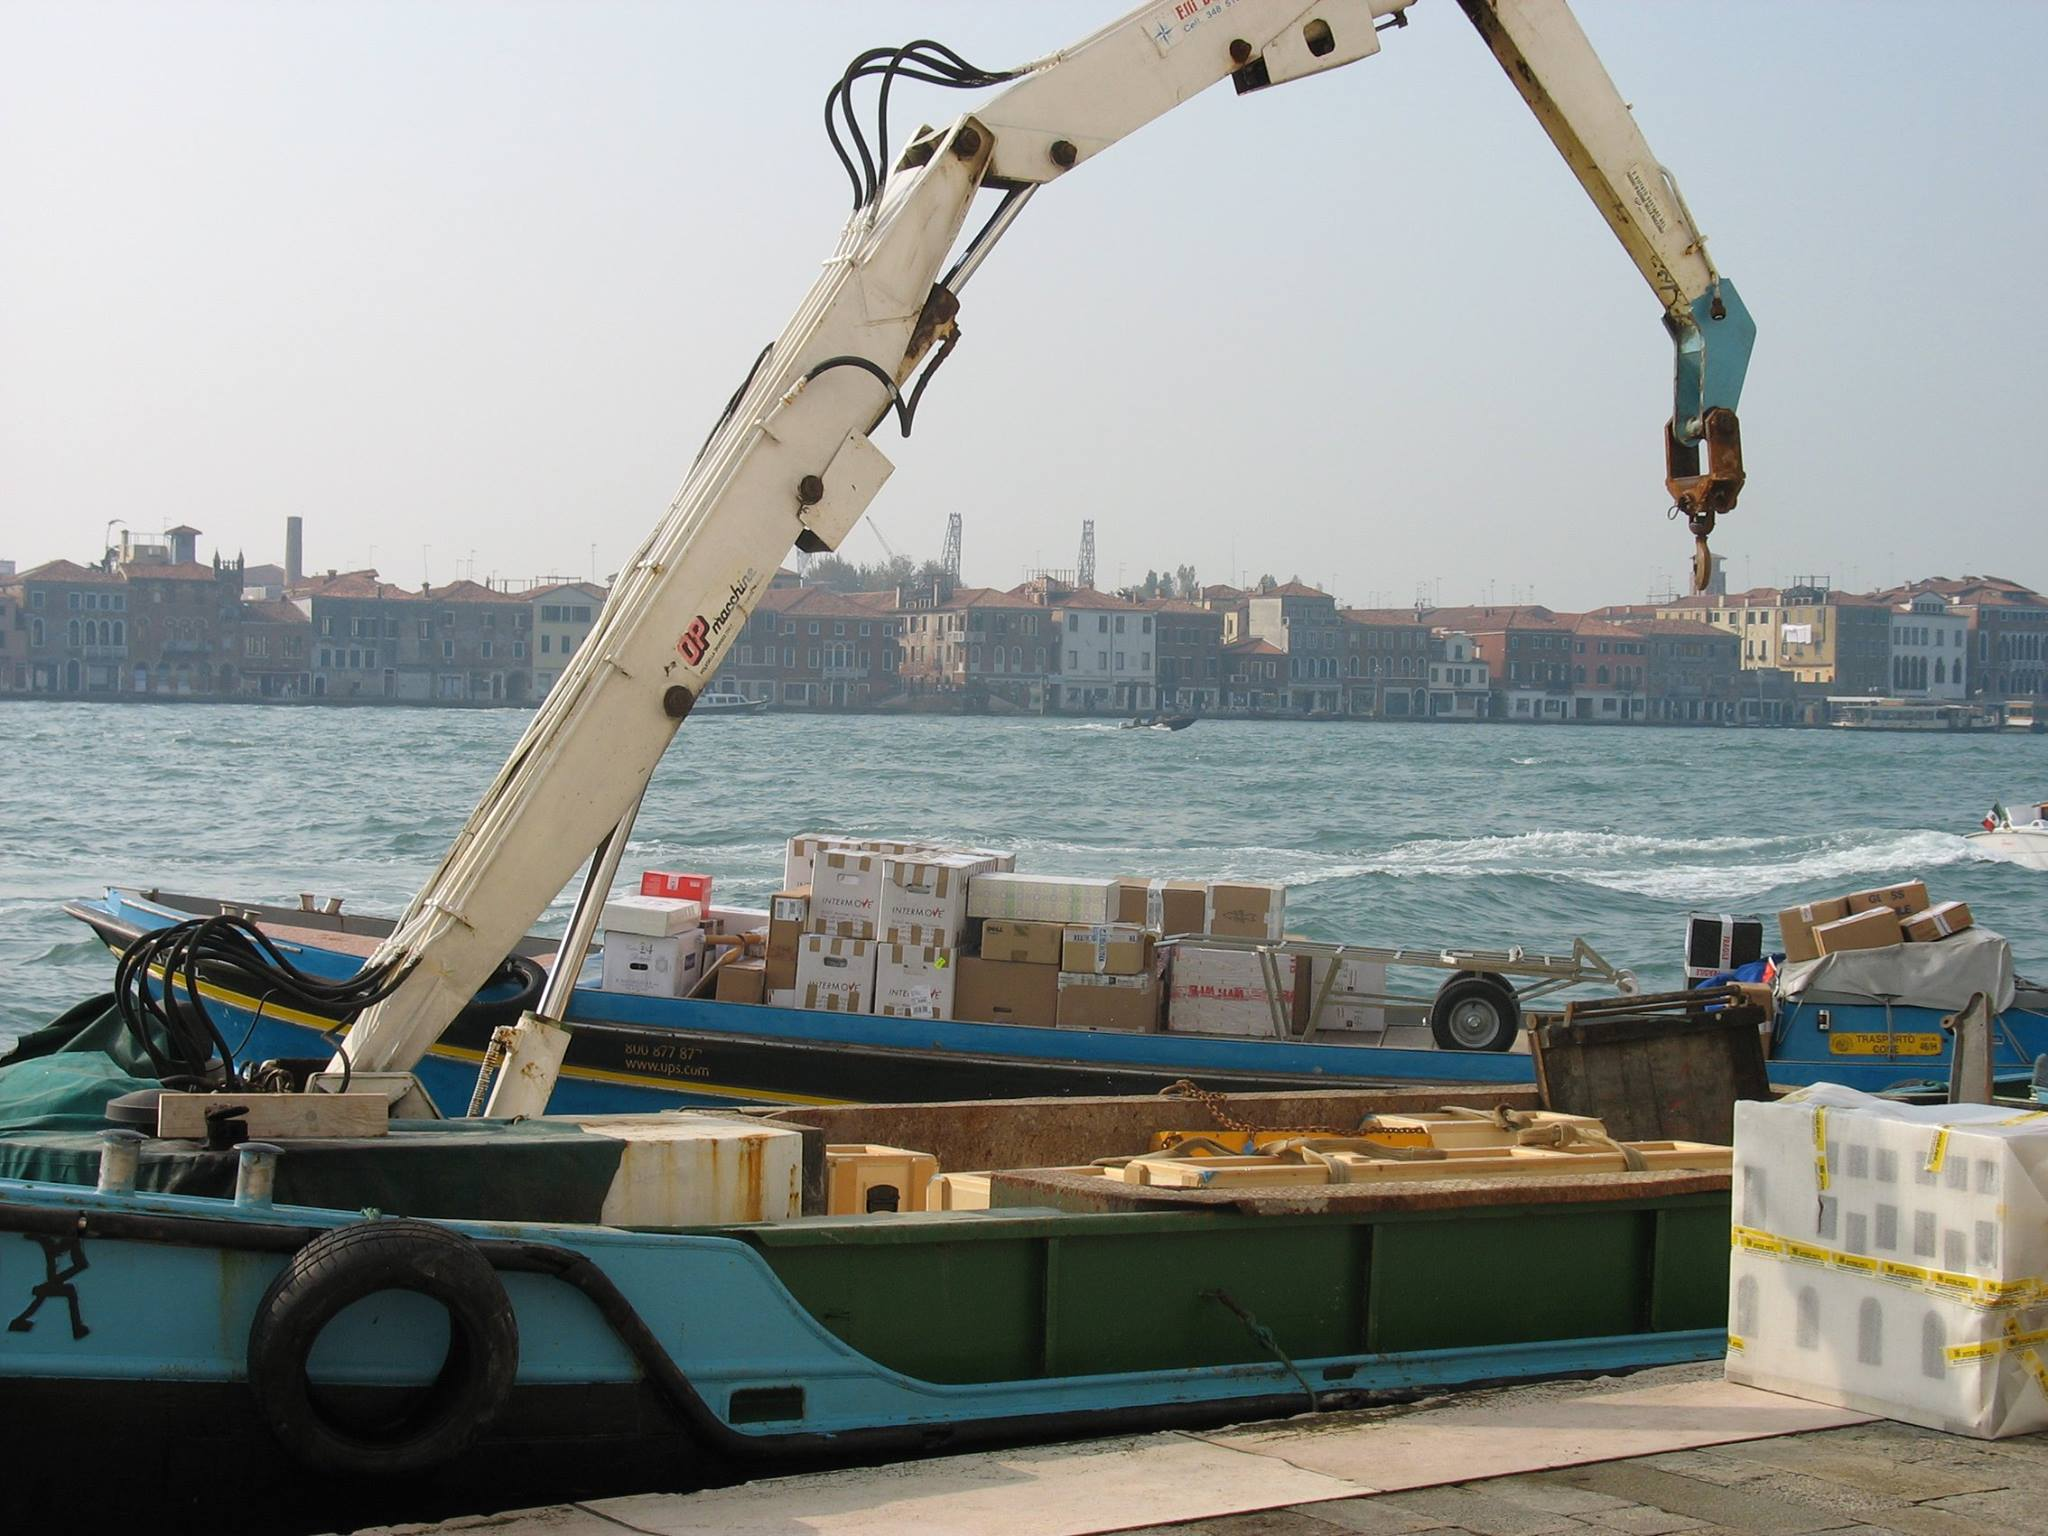 Deliveries in Venice